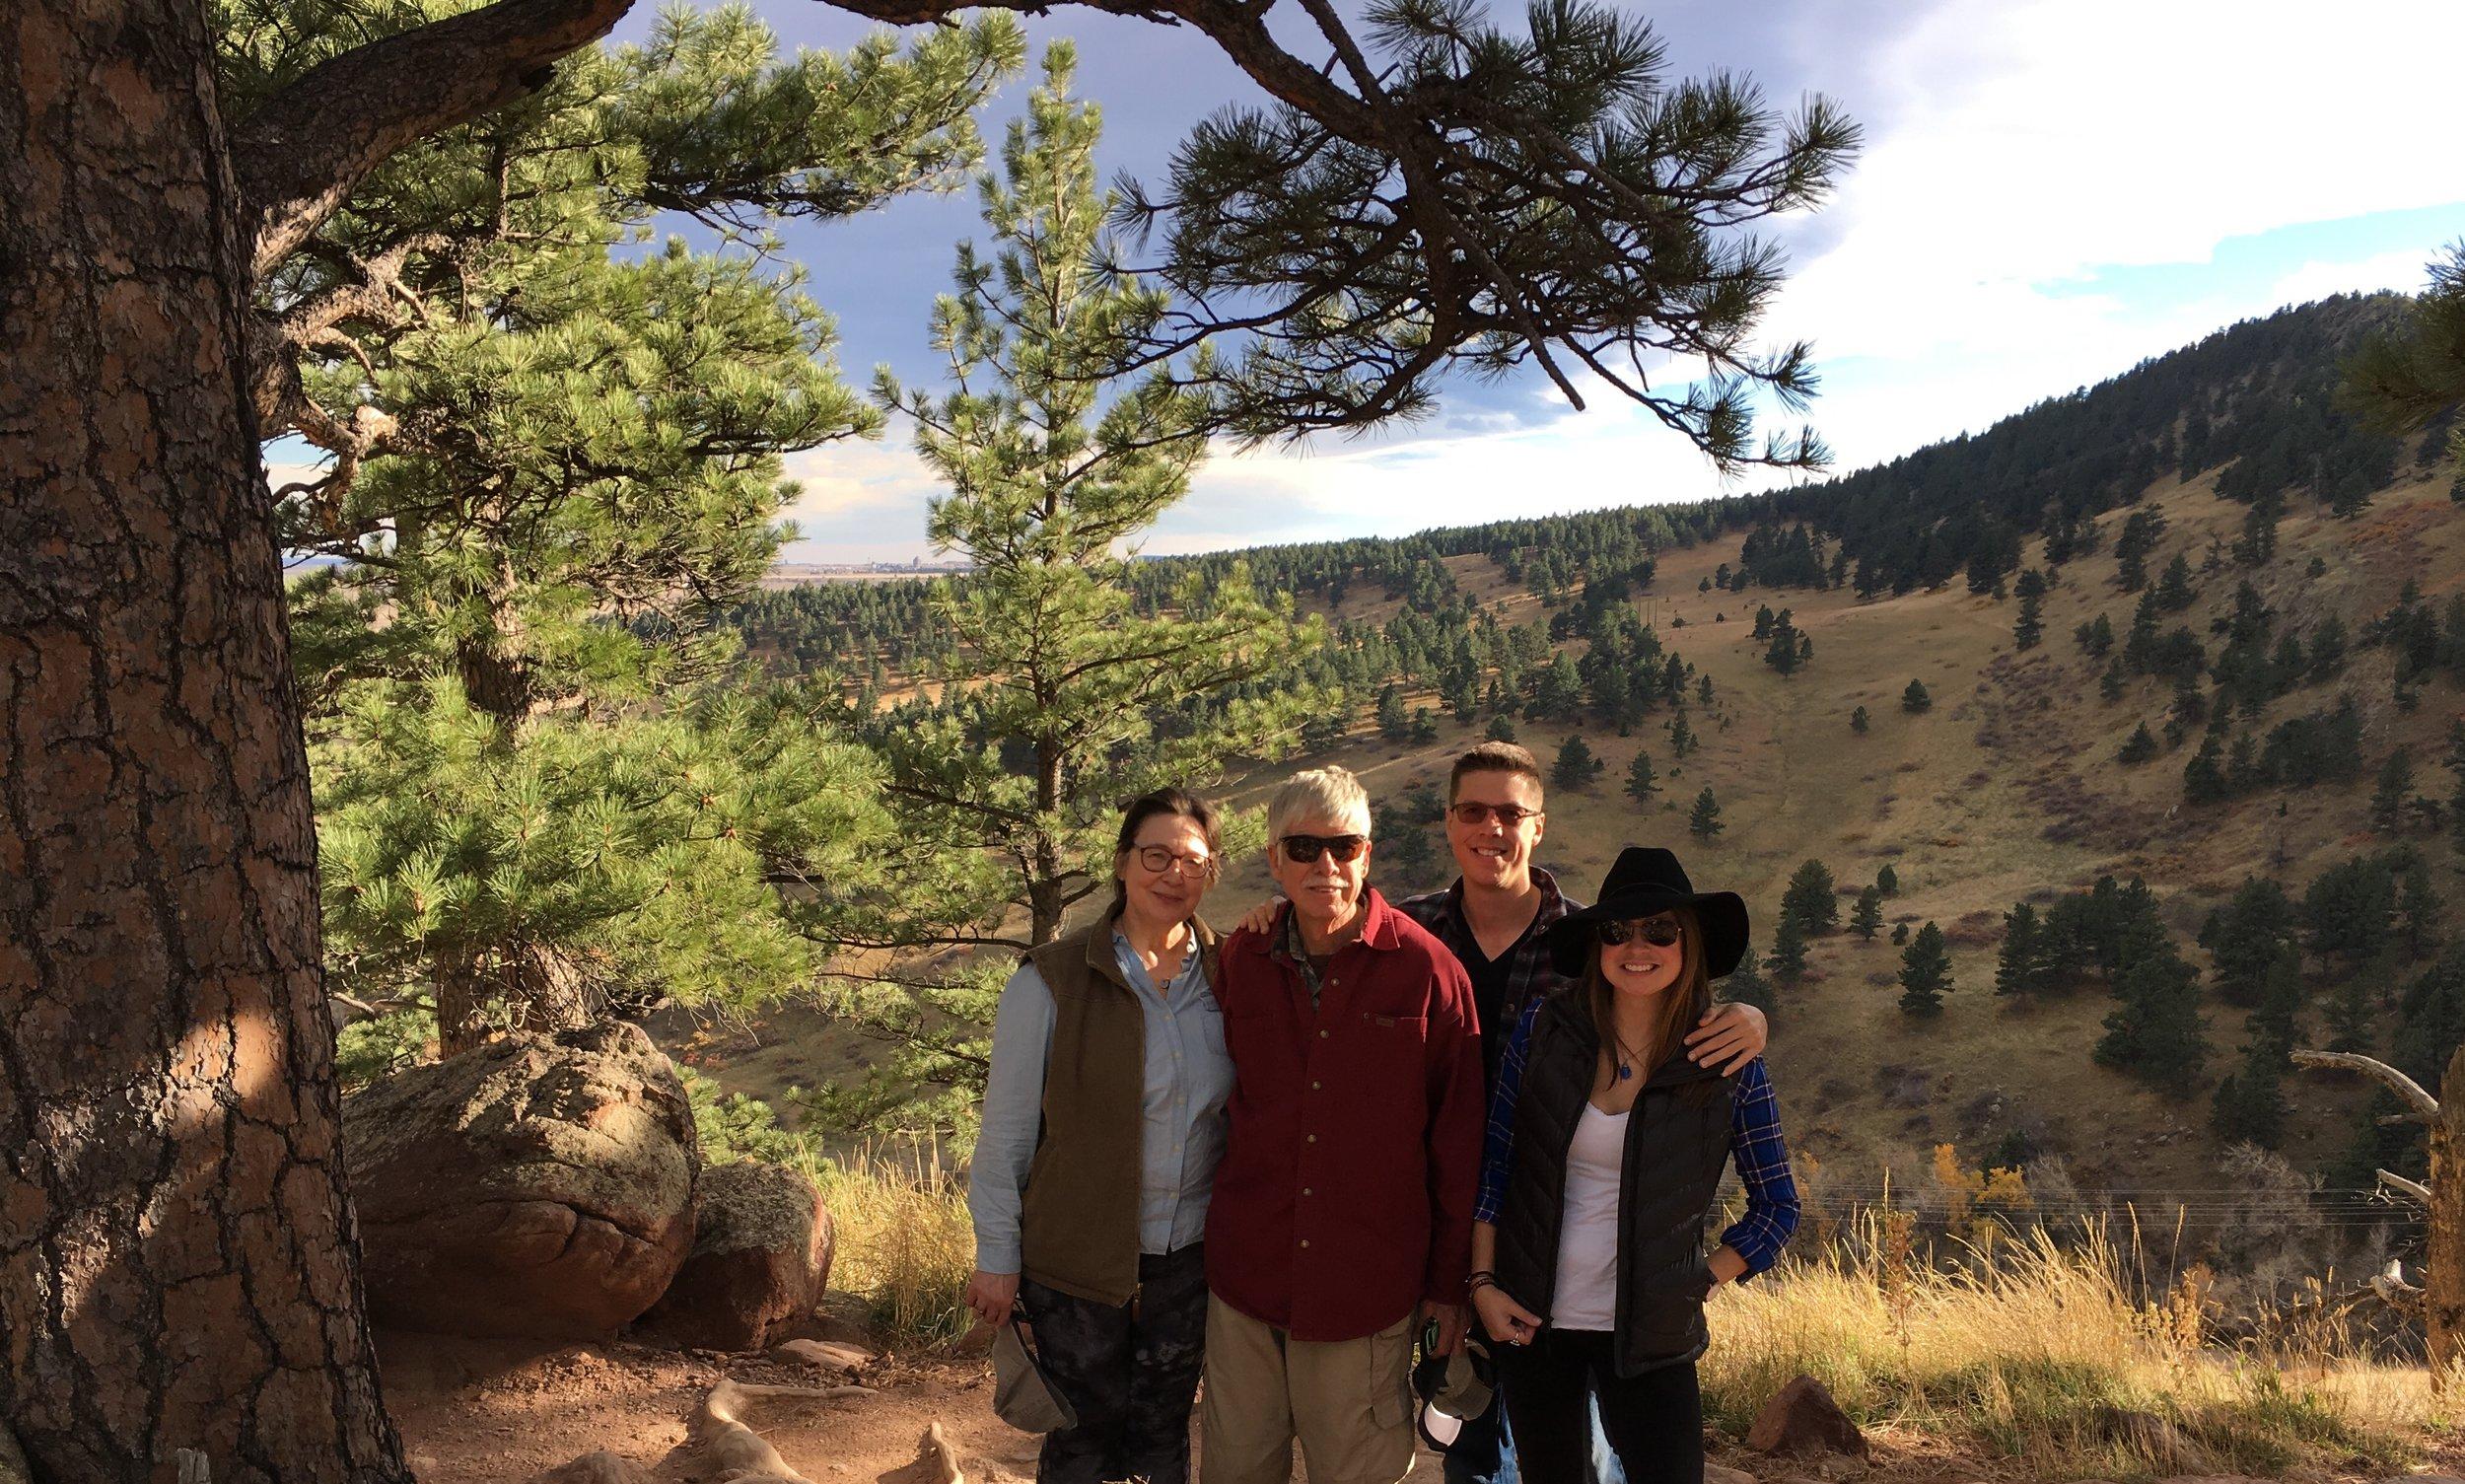 Trail at NCAR in Boulder